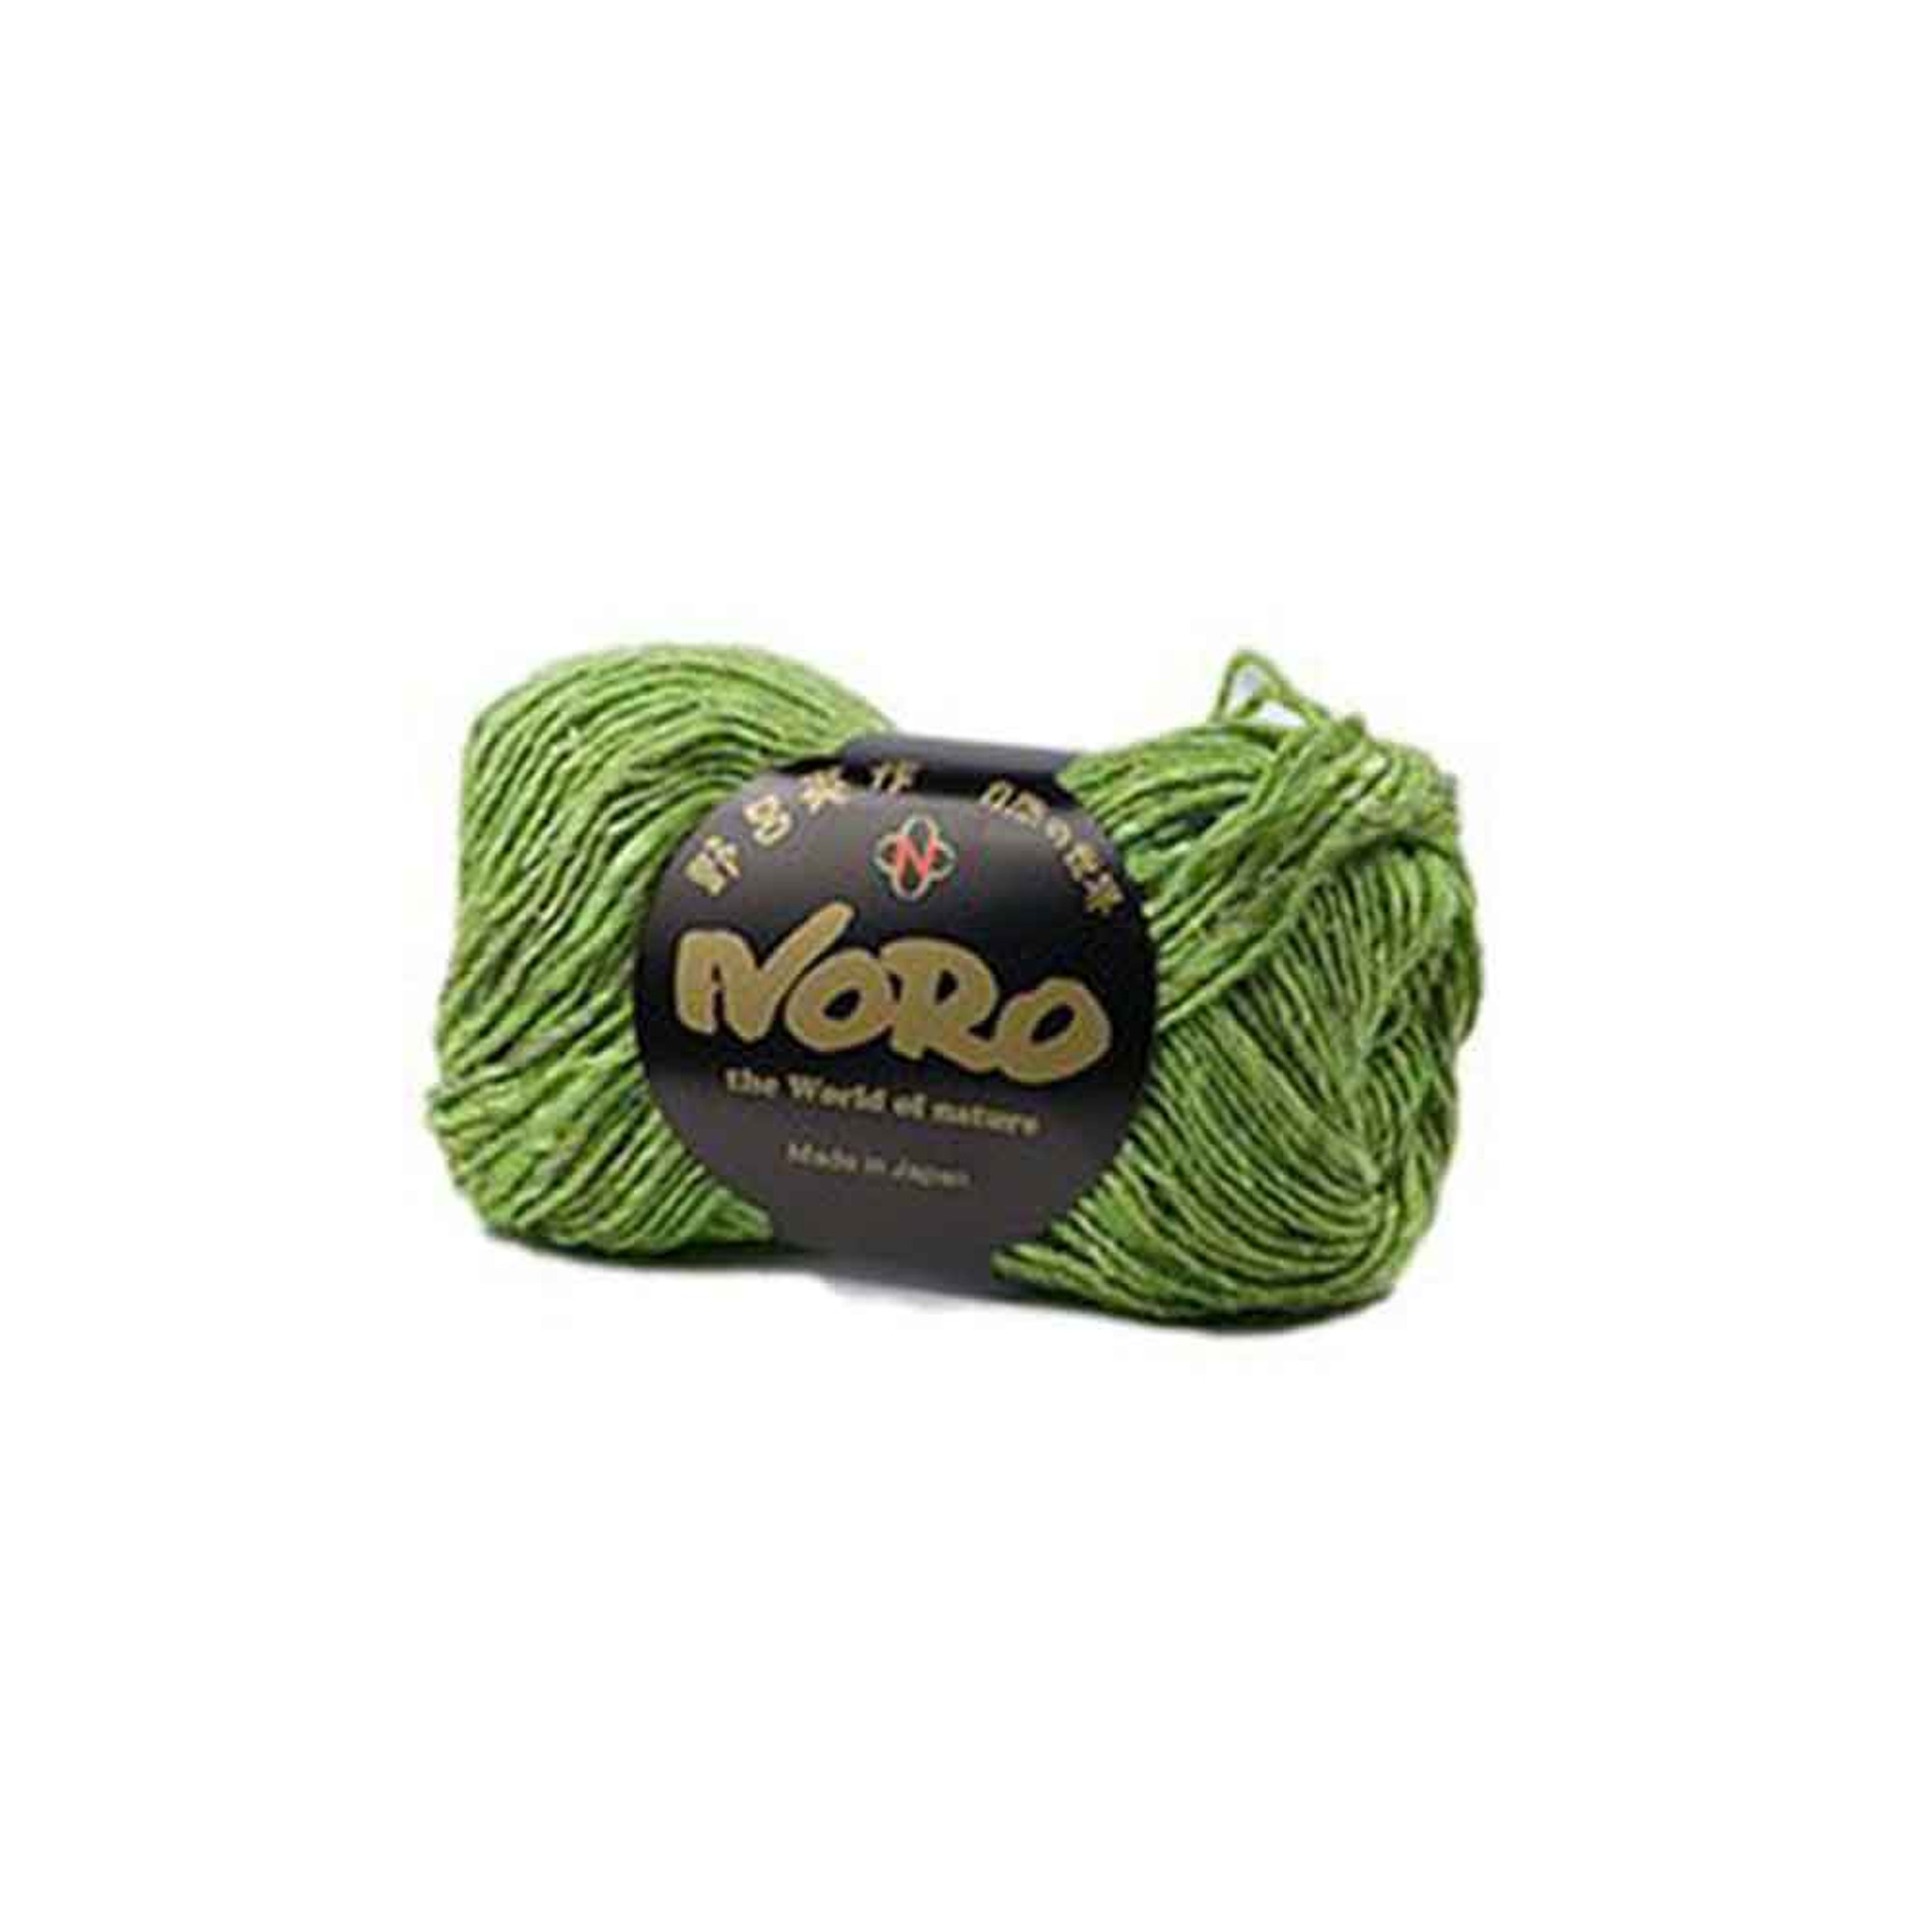 Noro Silk Garden Solo Knitting Yarn Various Shades Outback Yarns